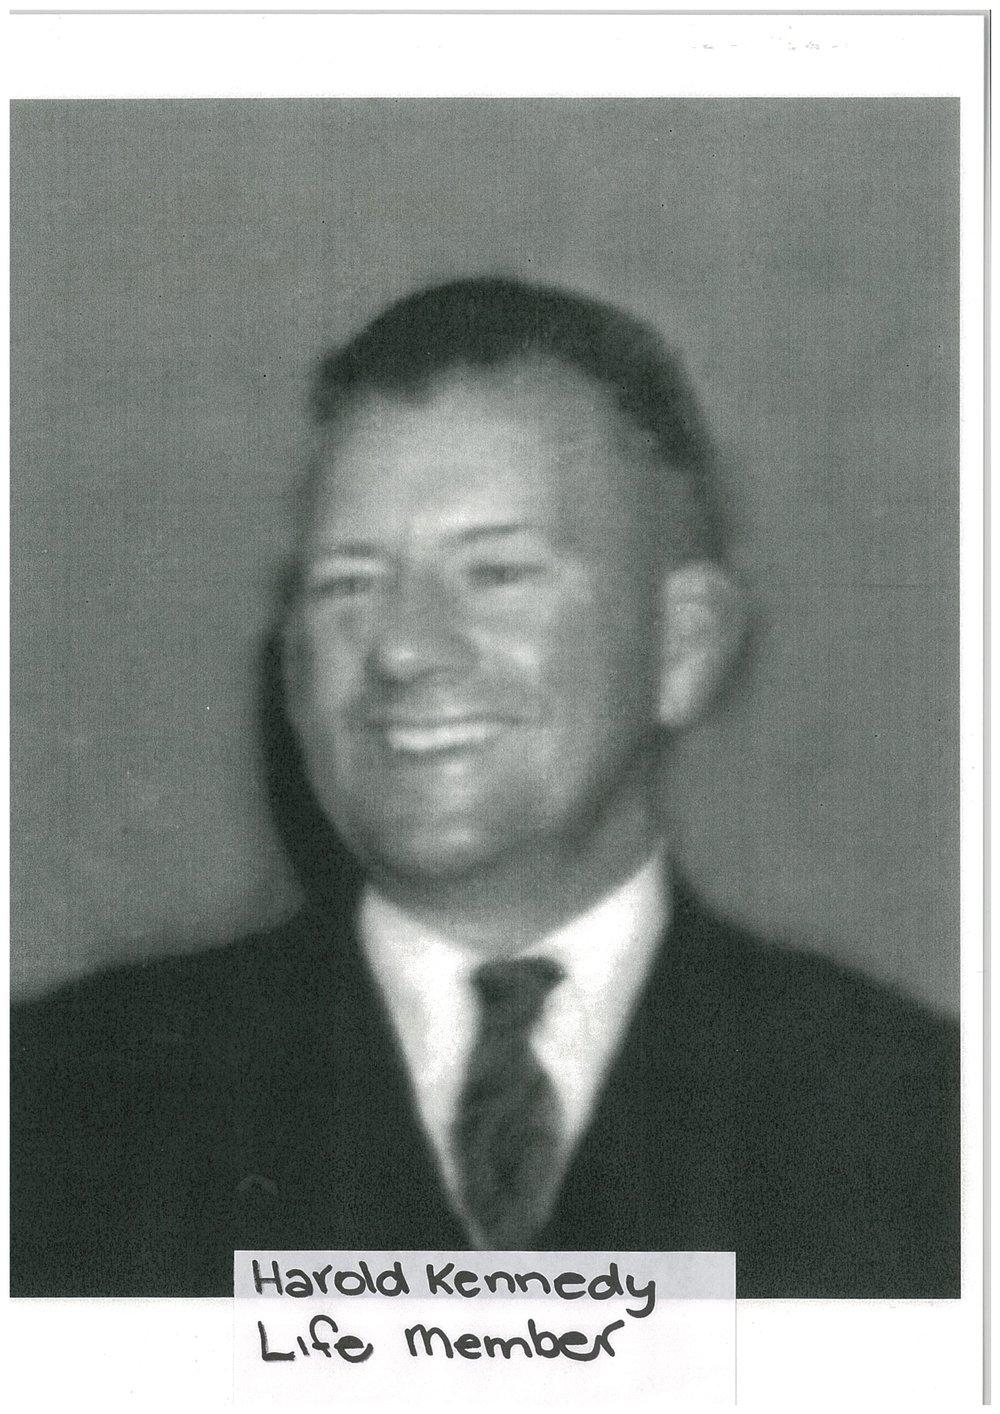 1956 - Harold Kennedy